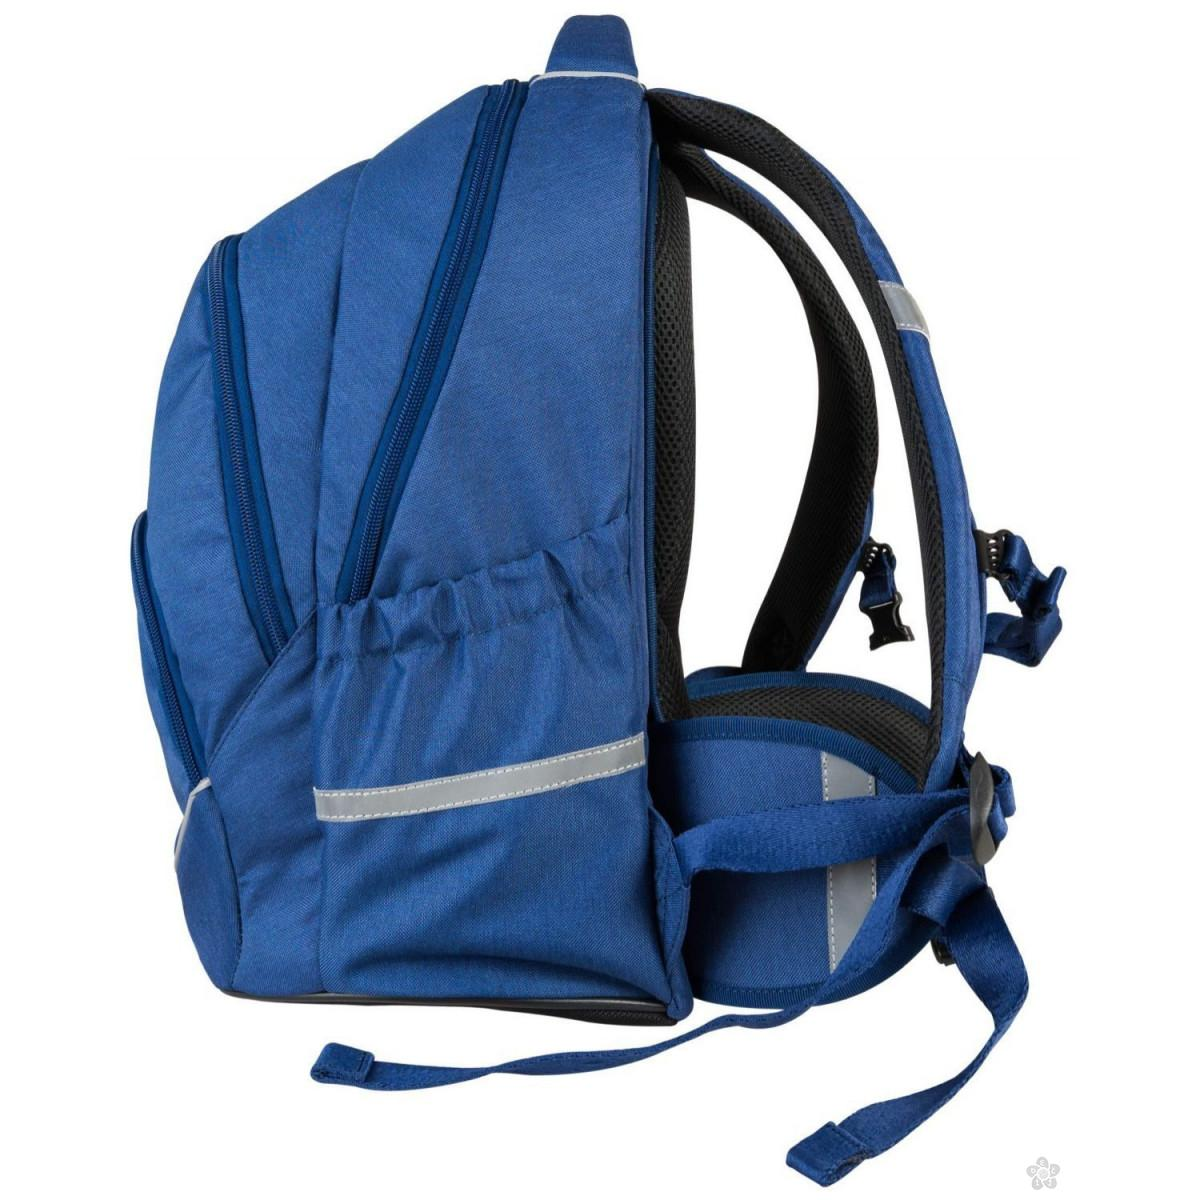 Anatomski ranac Flow Pack Blue 26287